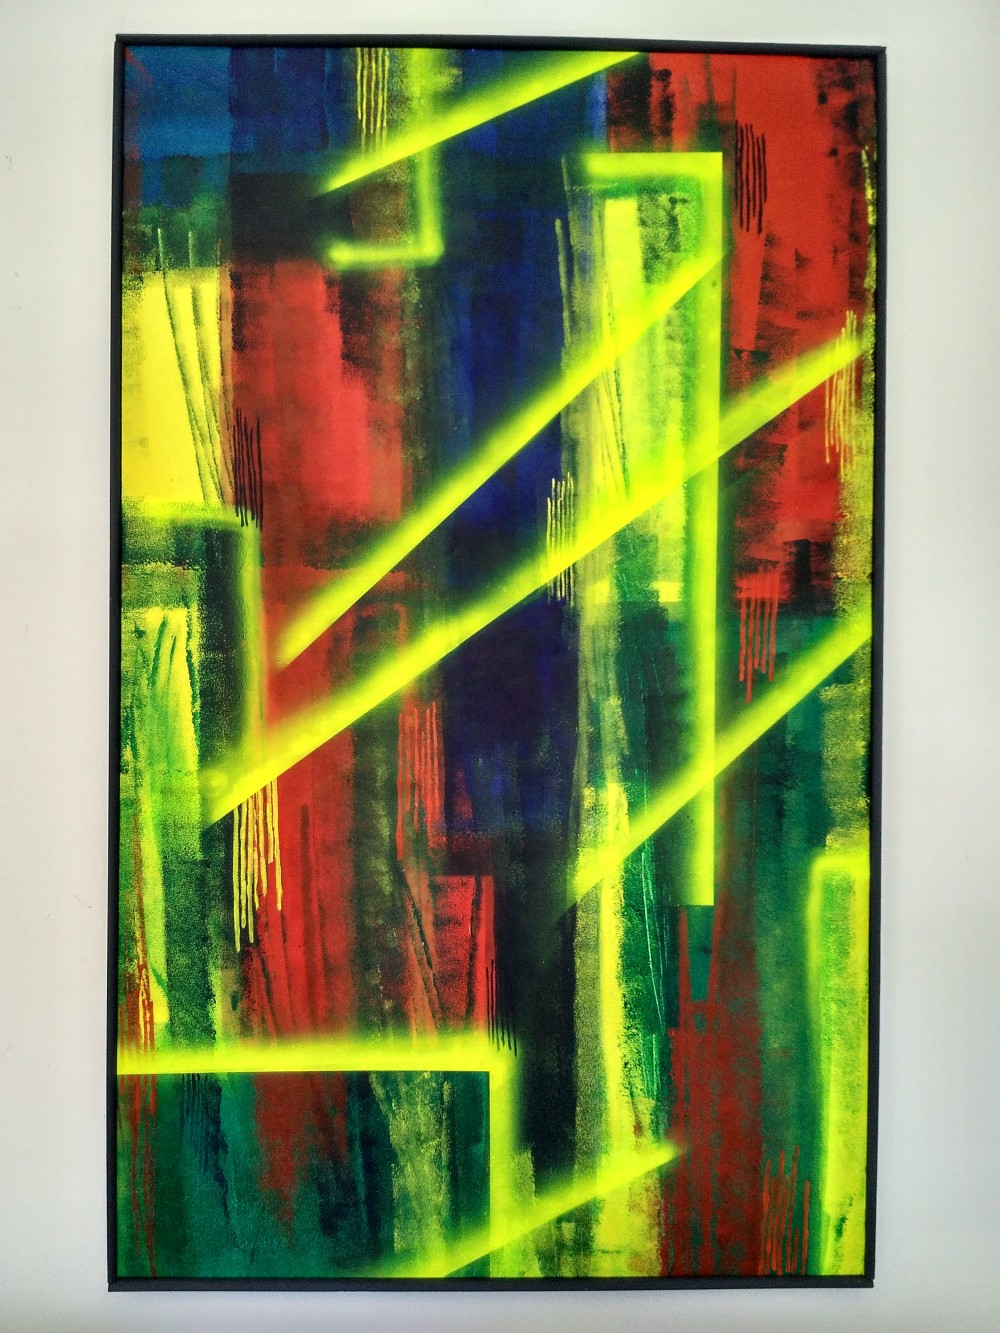 Kerstin Carolin Beyer, Leuchtstoffröhren, Big format, flourescent